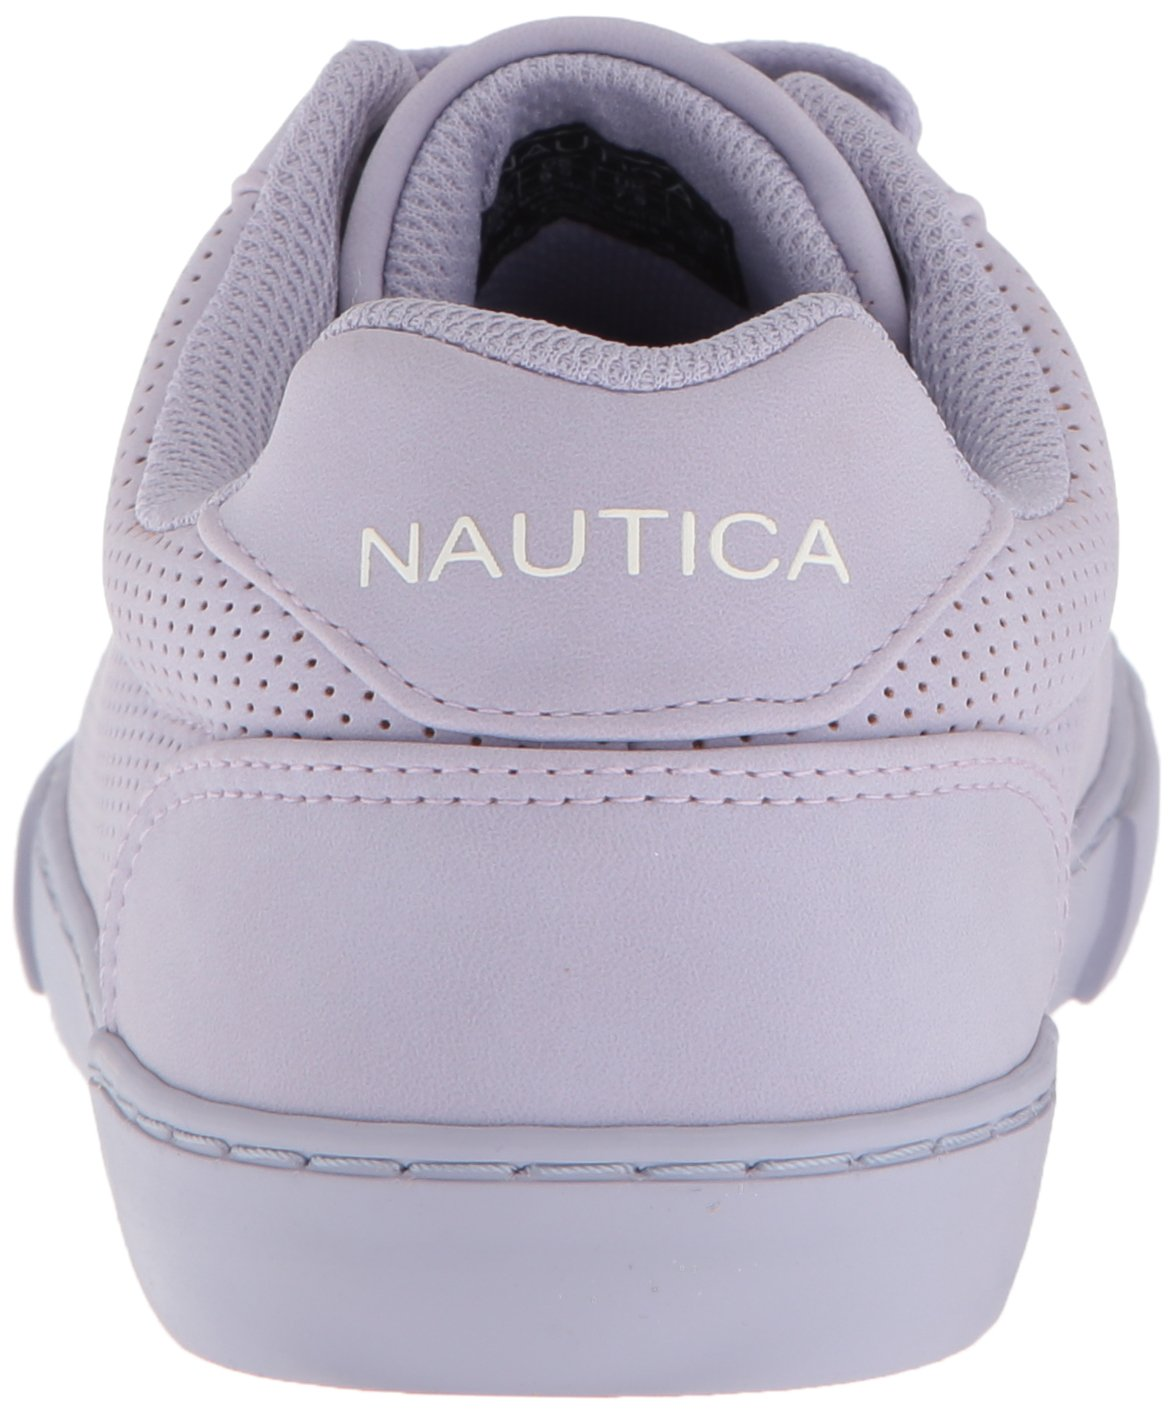 Nautica Women's Steam Sneaker B076ZZBCMV 8.5 B(M) US|Orchid